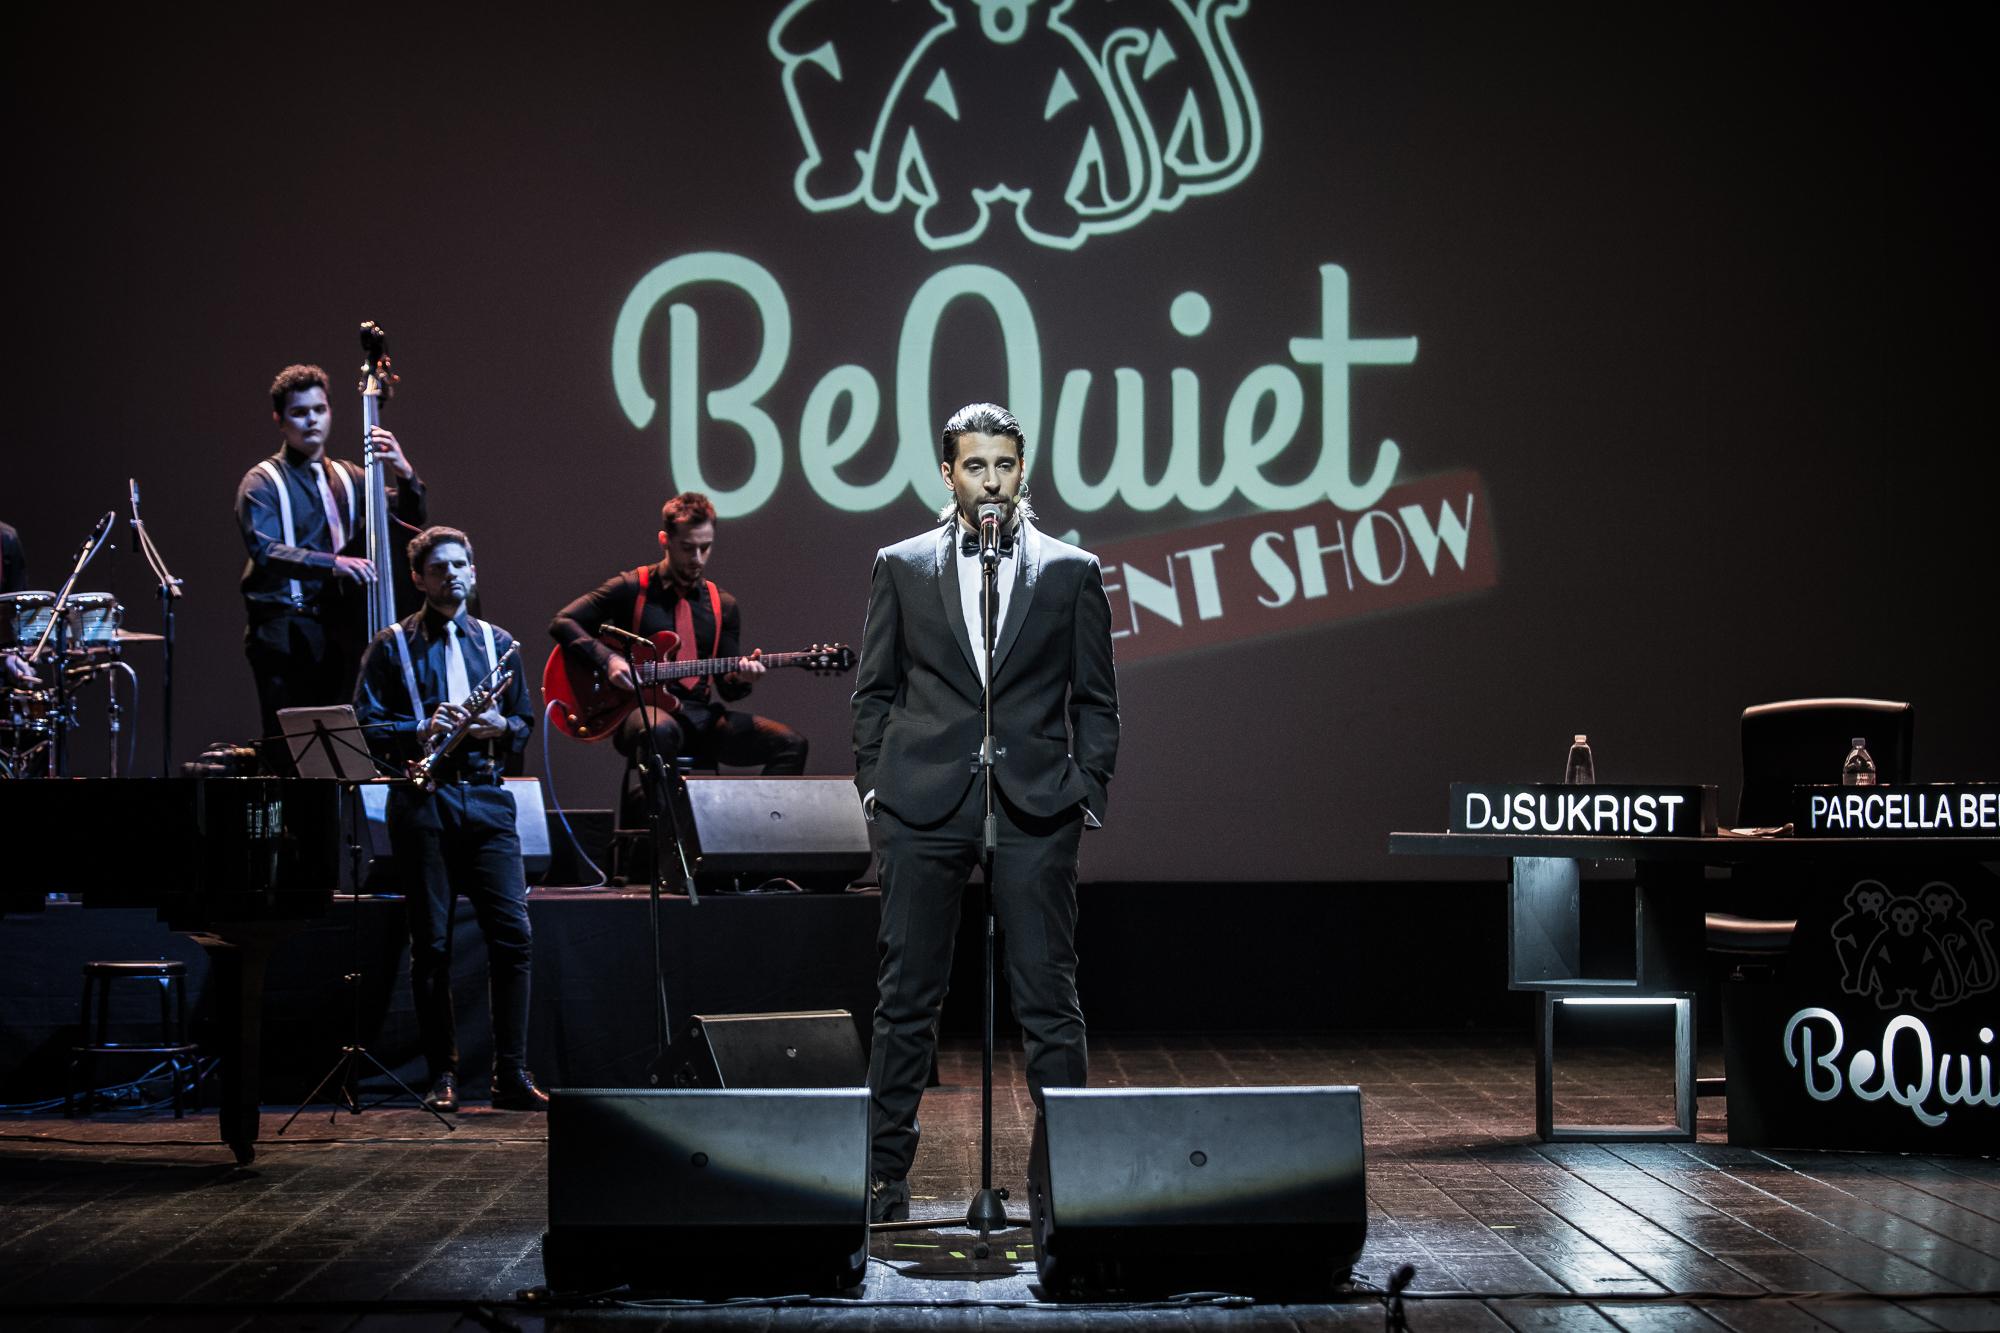 Be Quiet Talent Show 19 Dicembre 2018 TeatroBellini